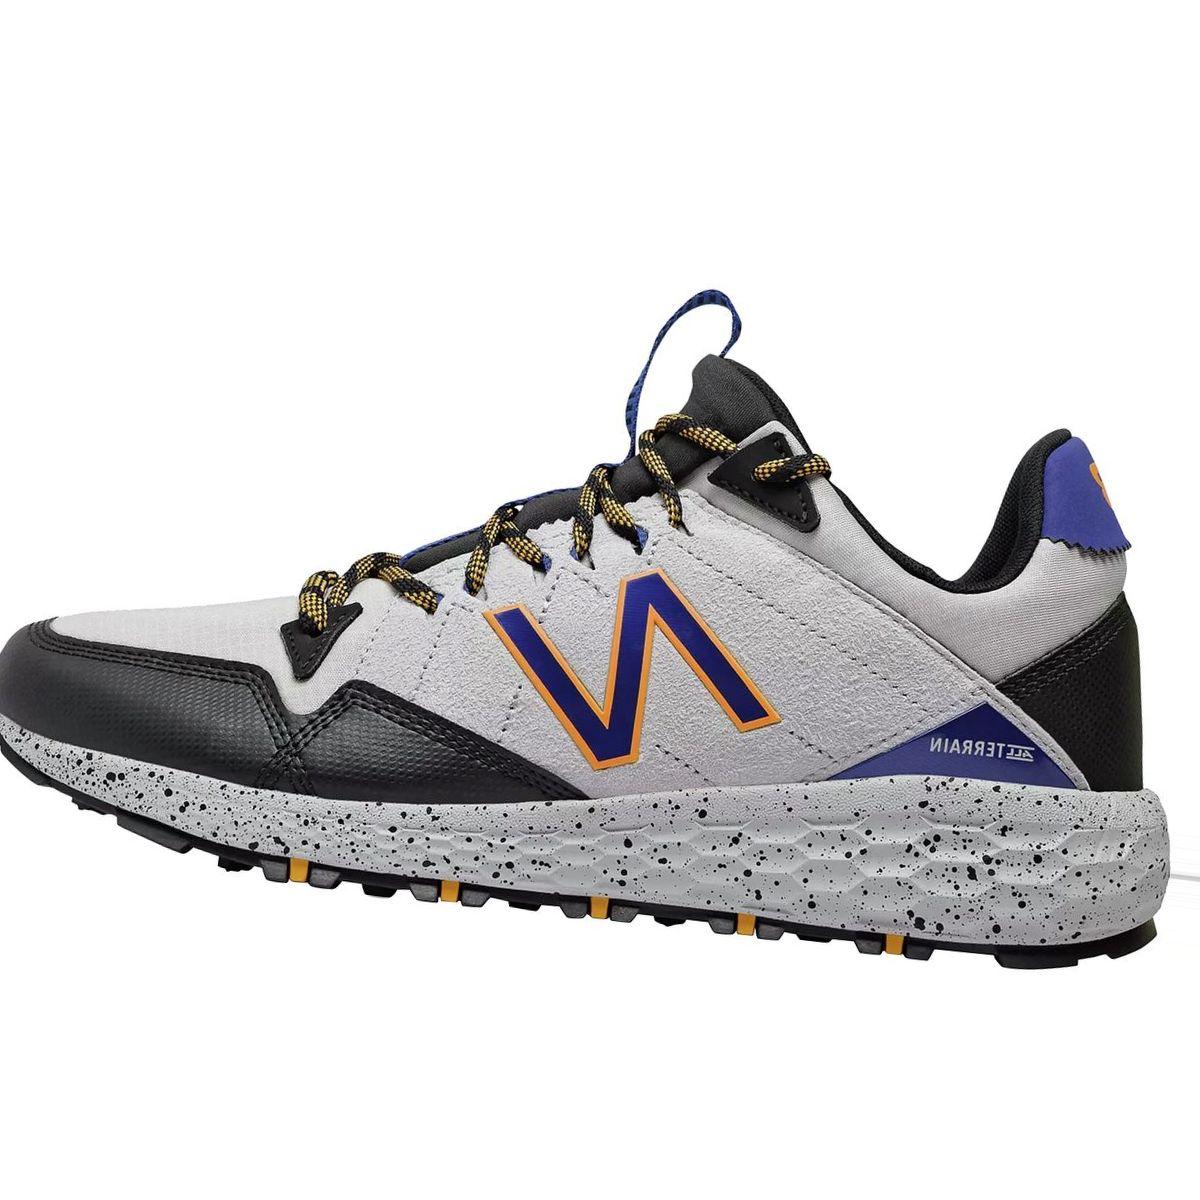 New Balance Fresh Foam Crag Trail Running Shoe - Men's